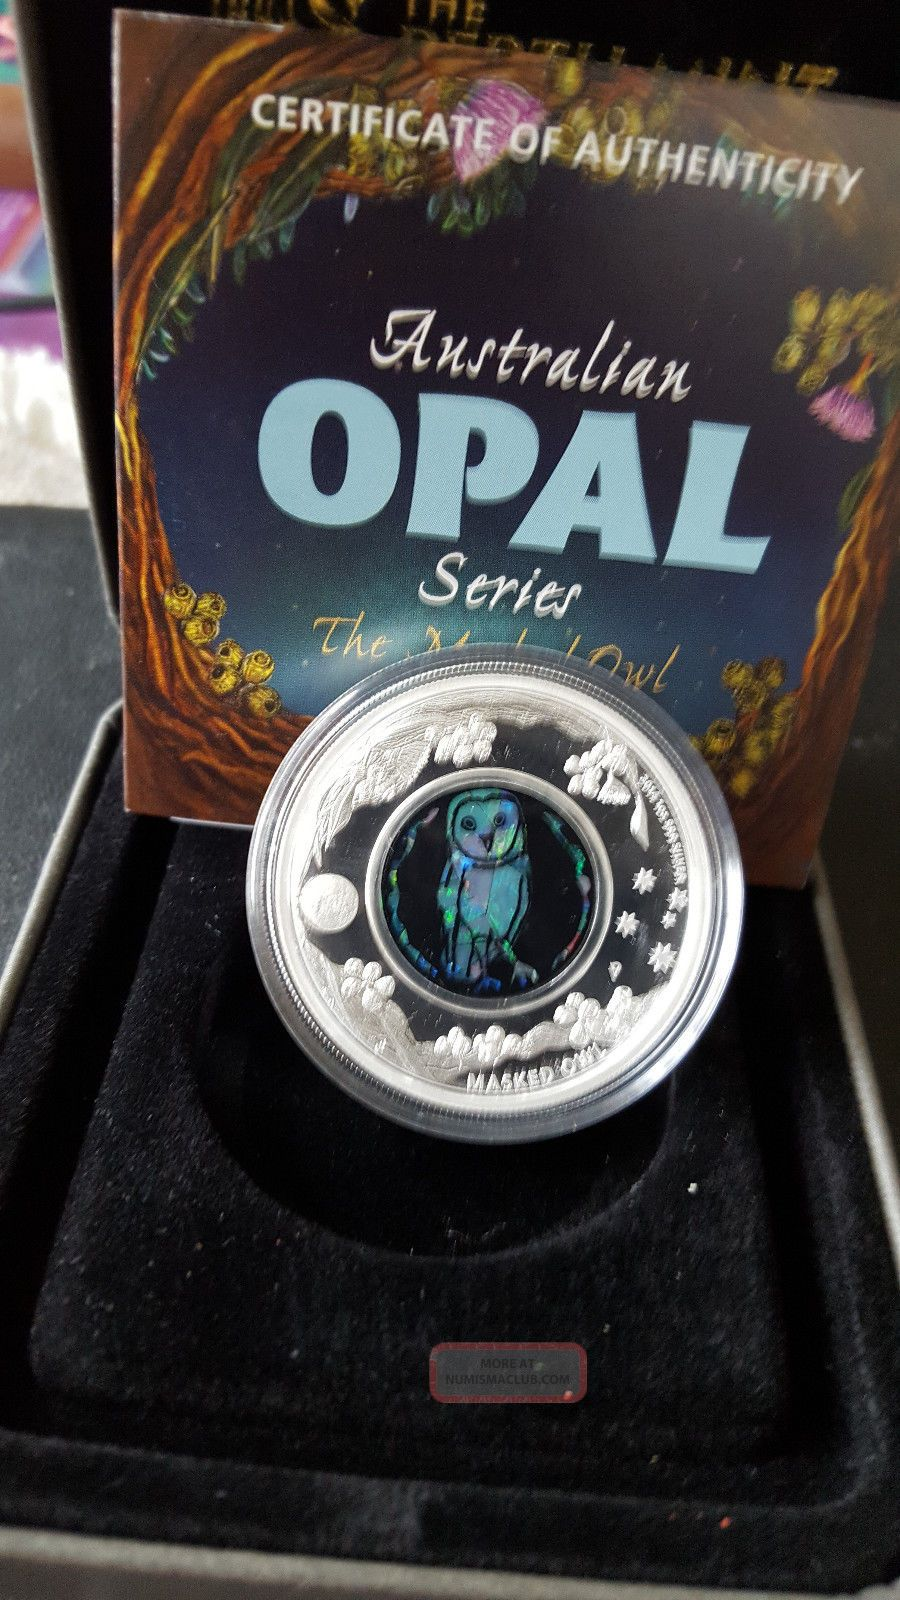 Australia 2014 Opal Series